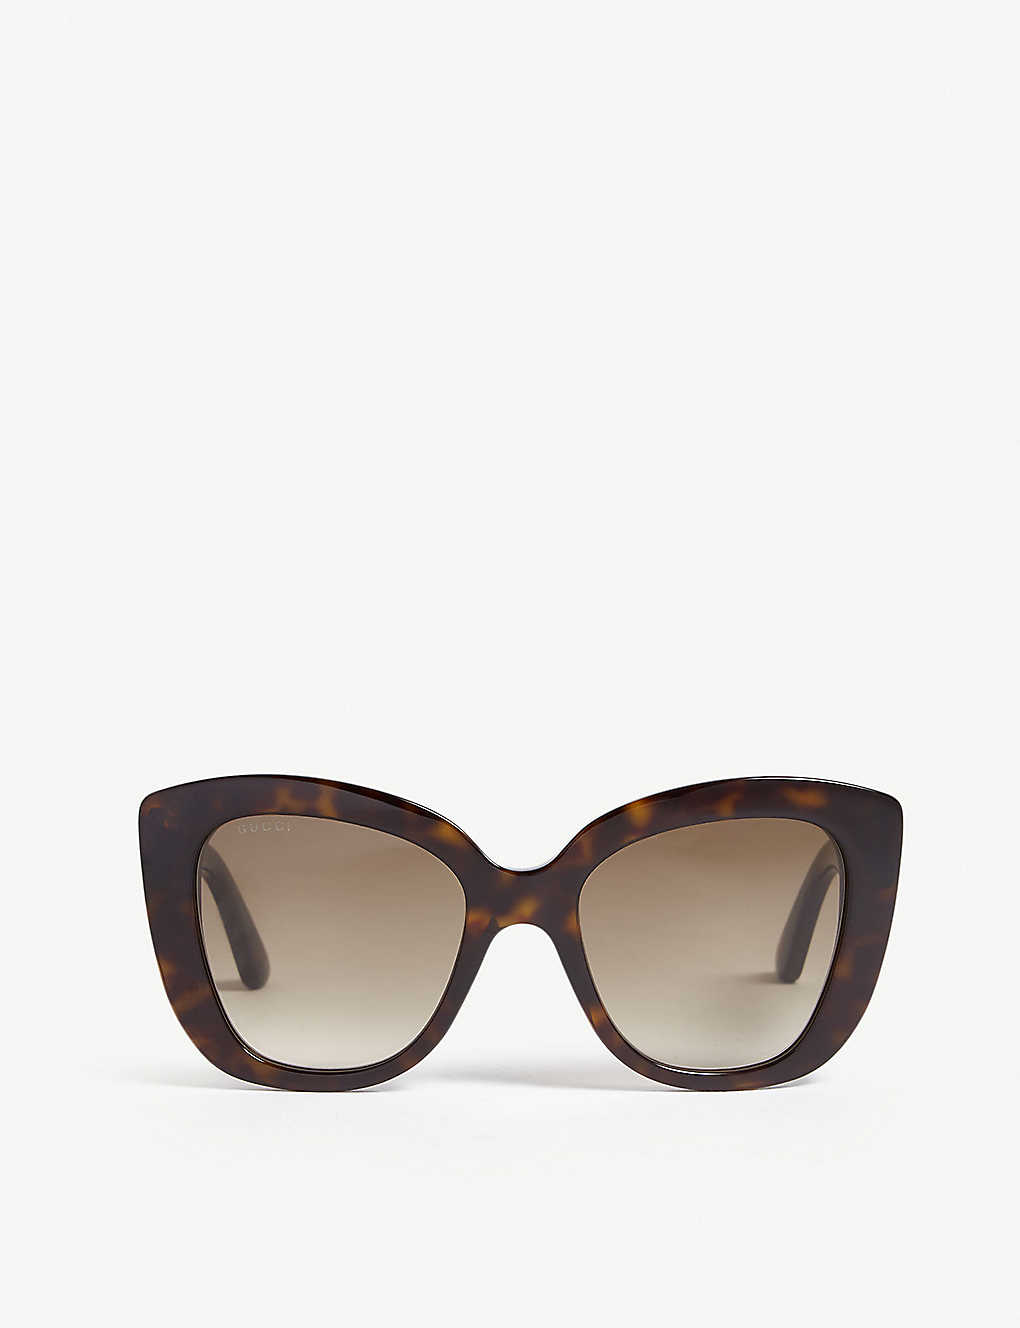 4be02e000488 GUCCI - Havana Gg0327s cat-eye frame sunglasses | Selfridges.com